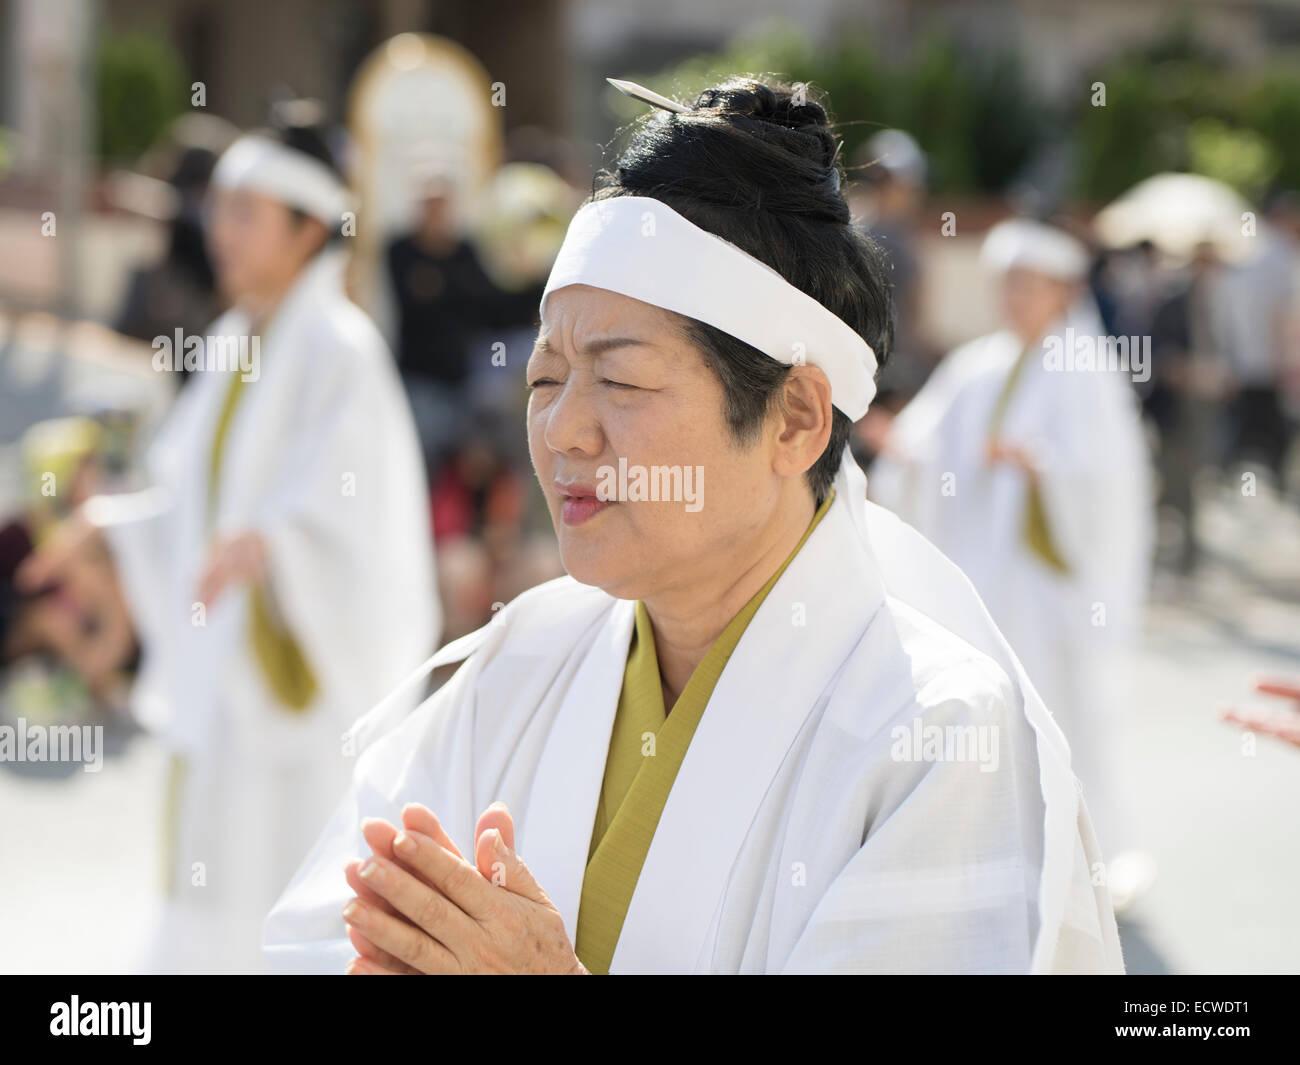 Yuta / noro / priestess at Shuri Castle Festival held in Naha City, Okinawa. - Stock Image